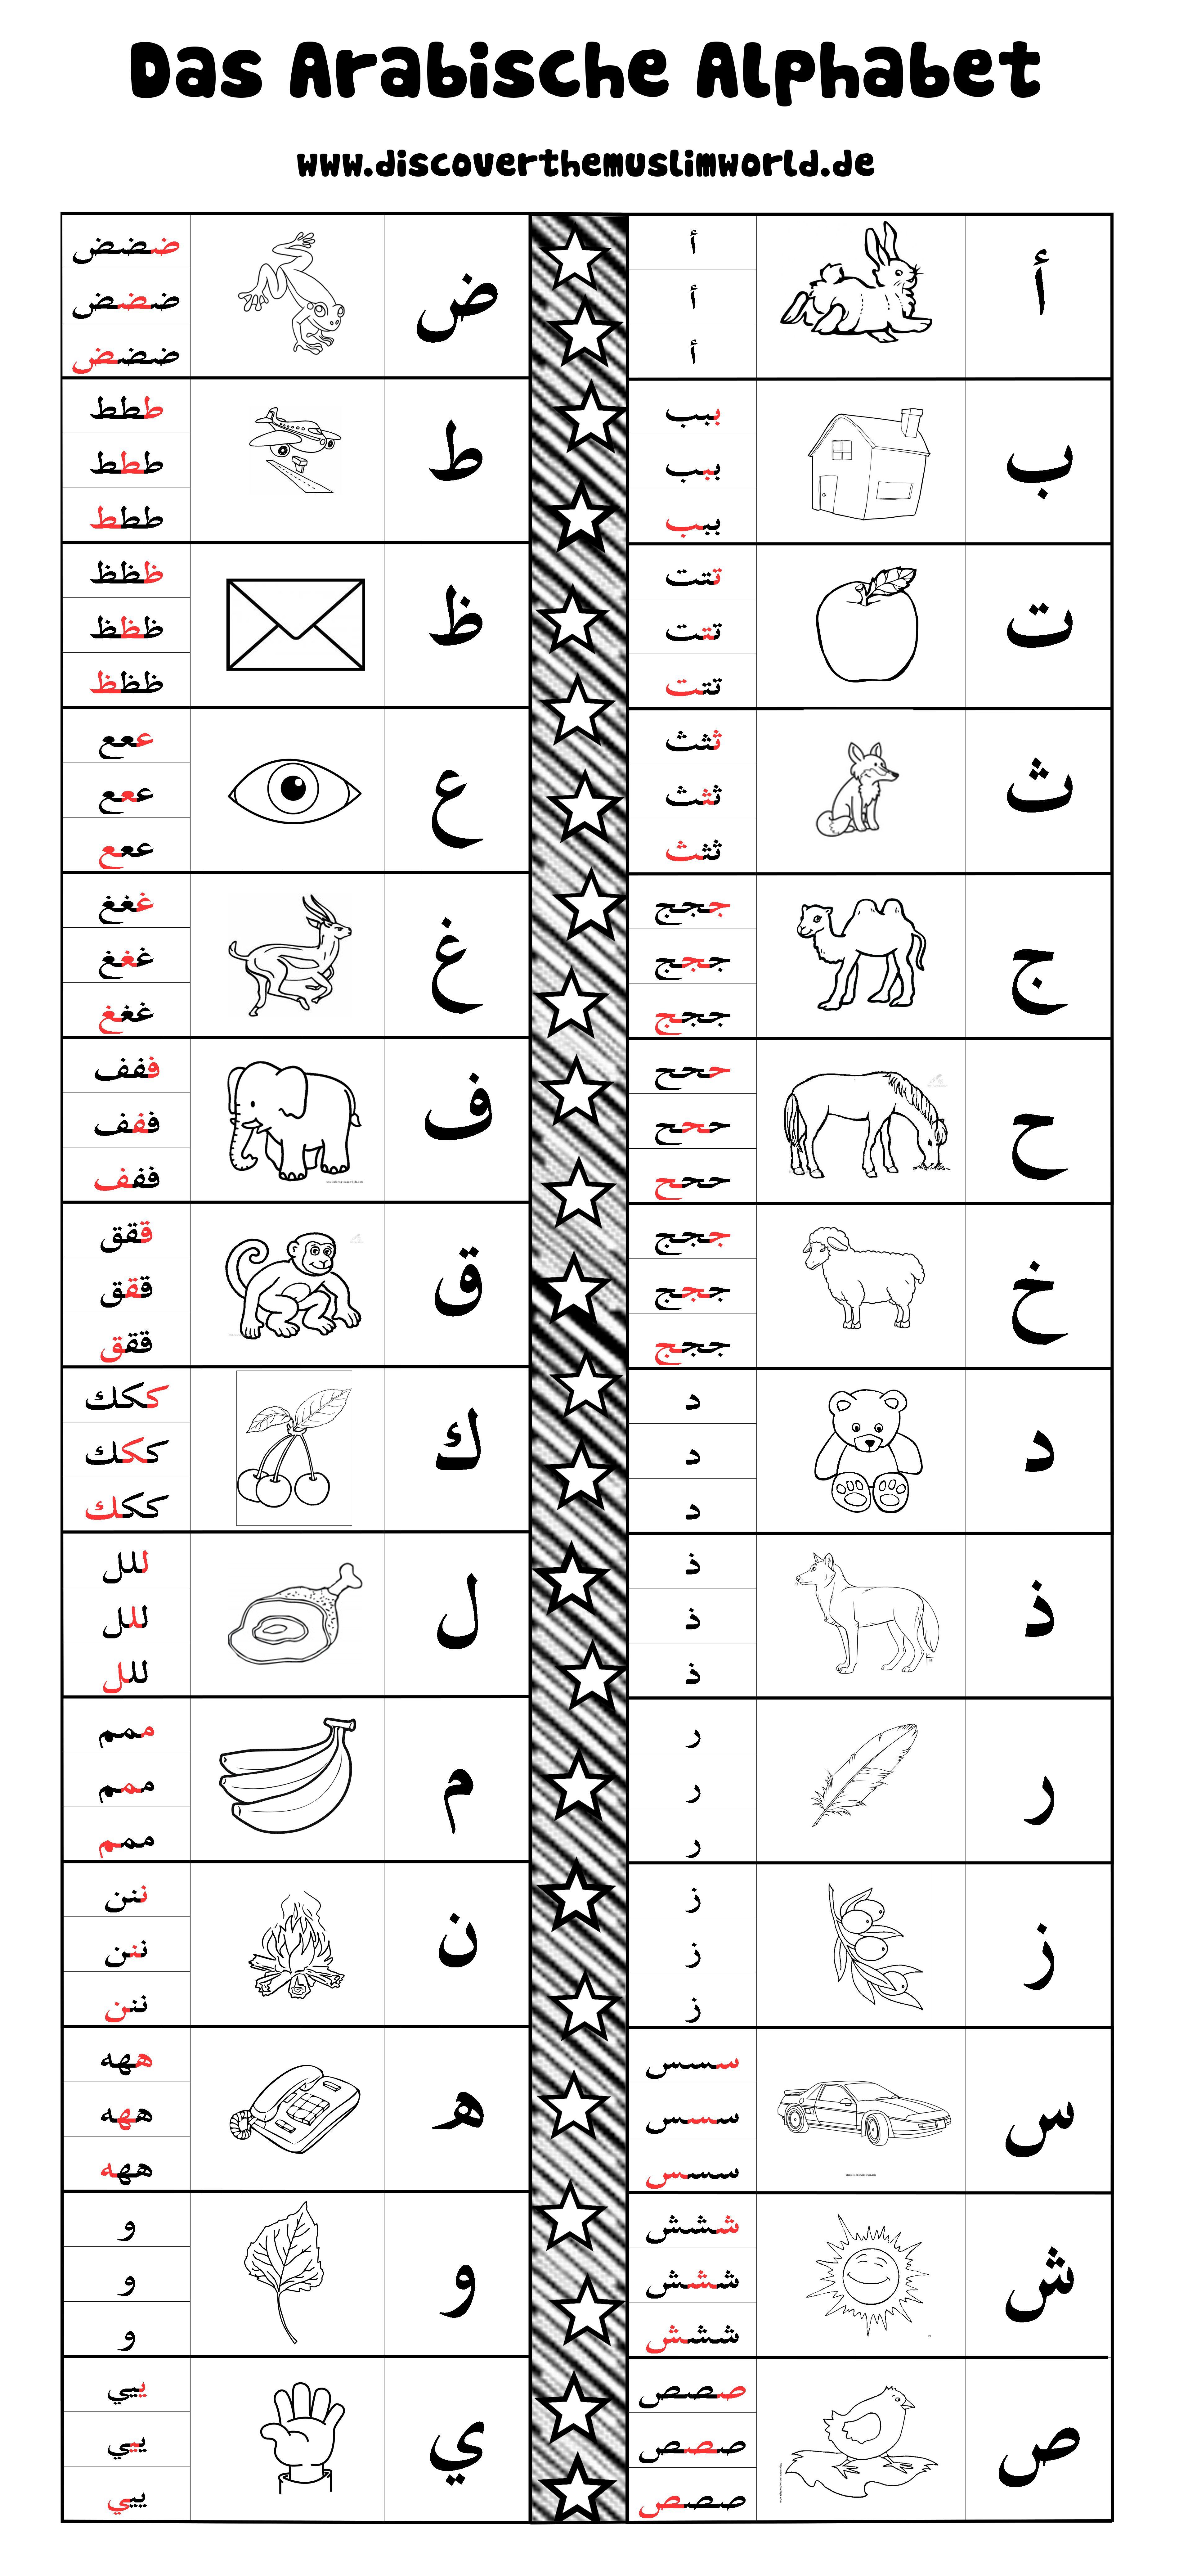 Arabic Alphabet Bw Ger